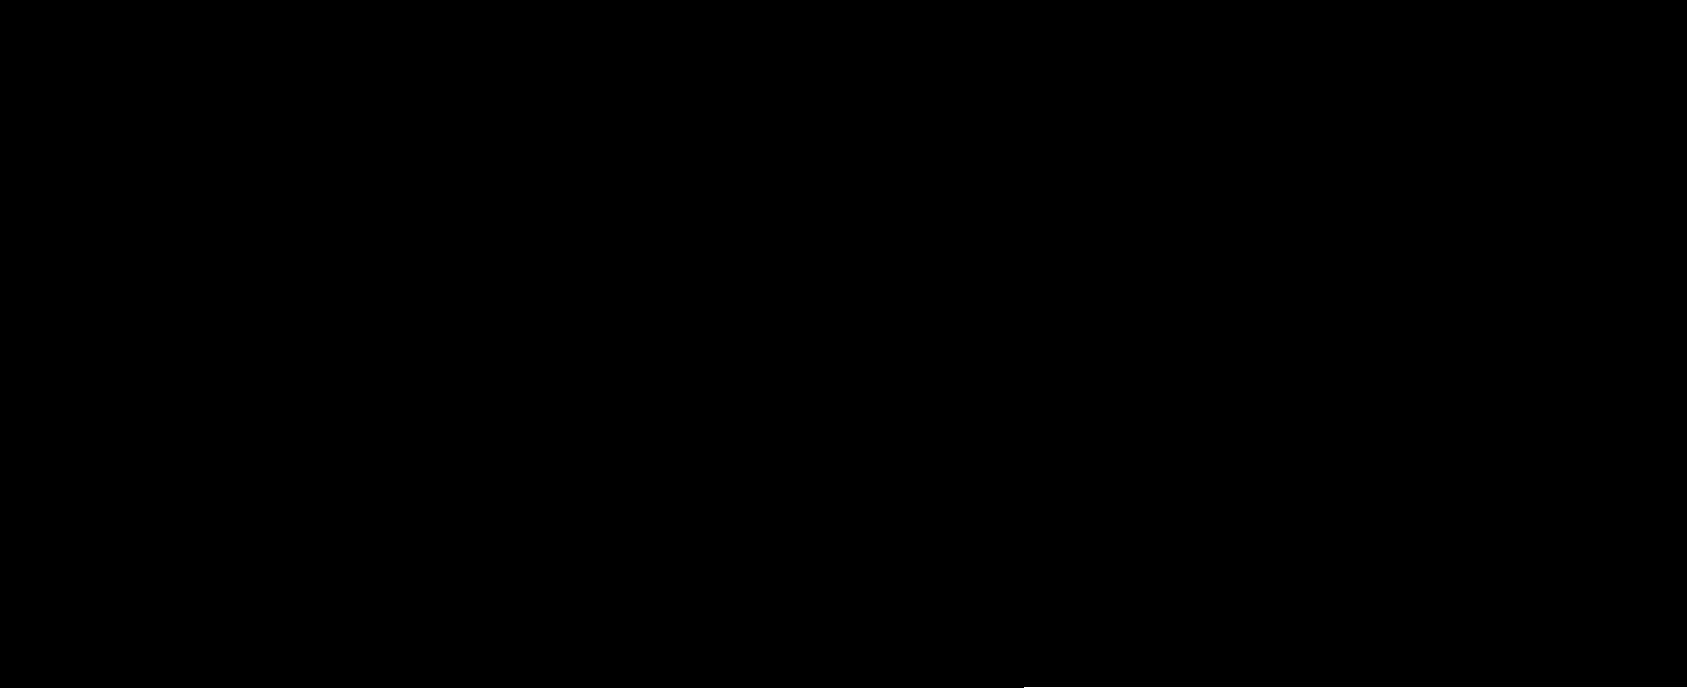 BBA logo black.png